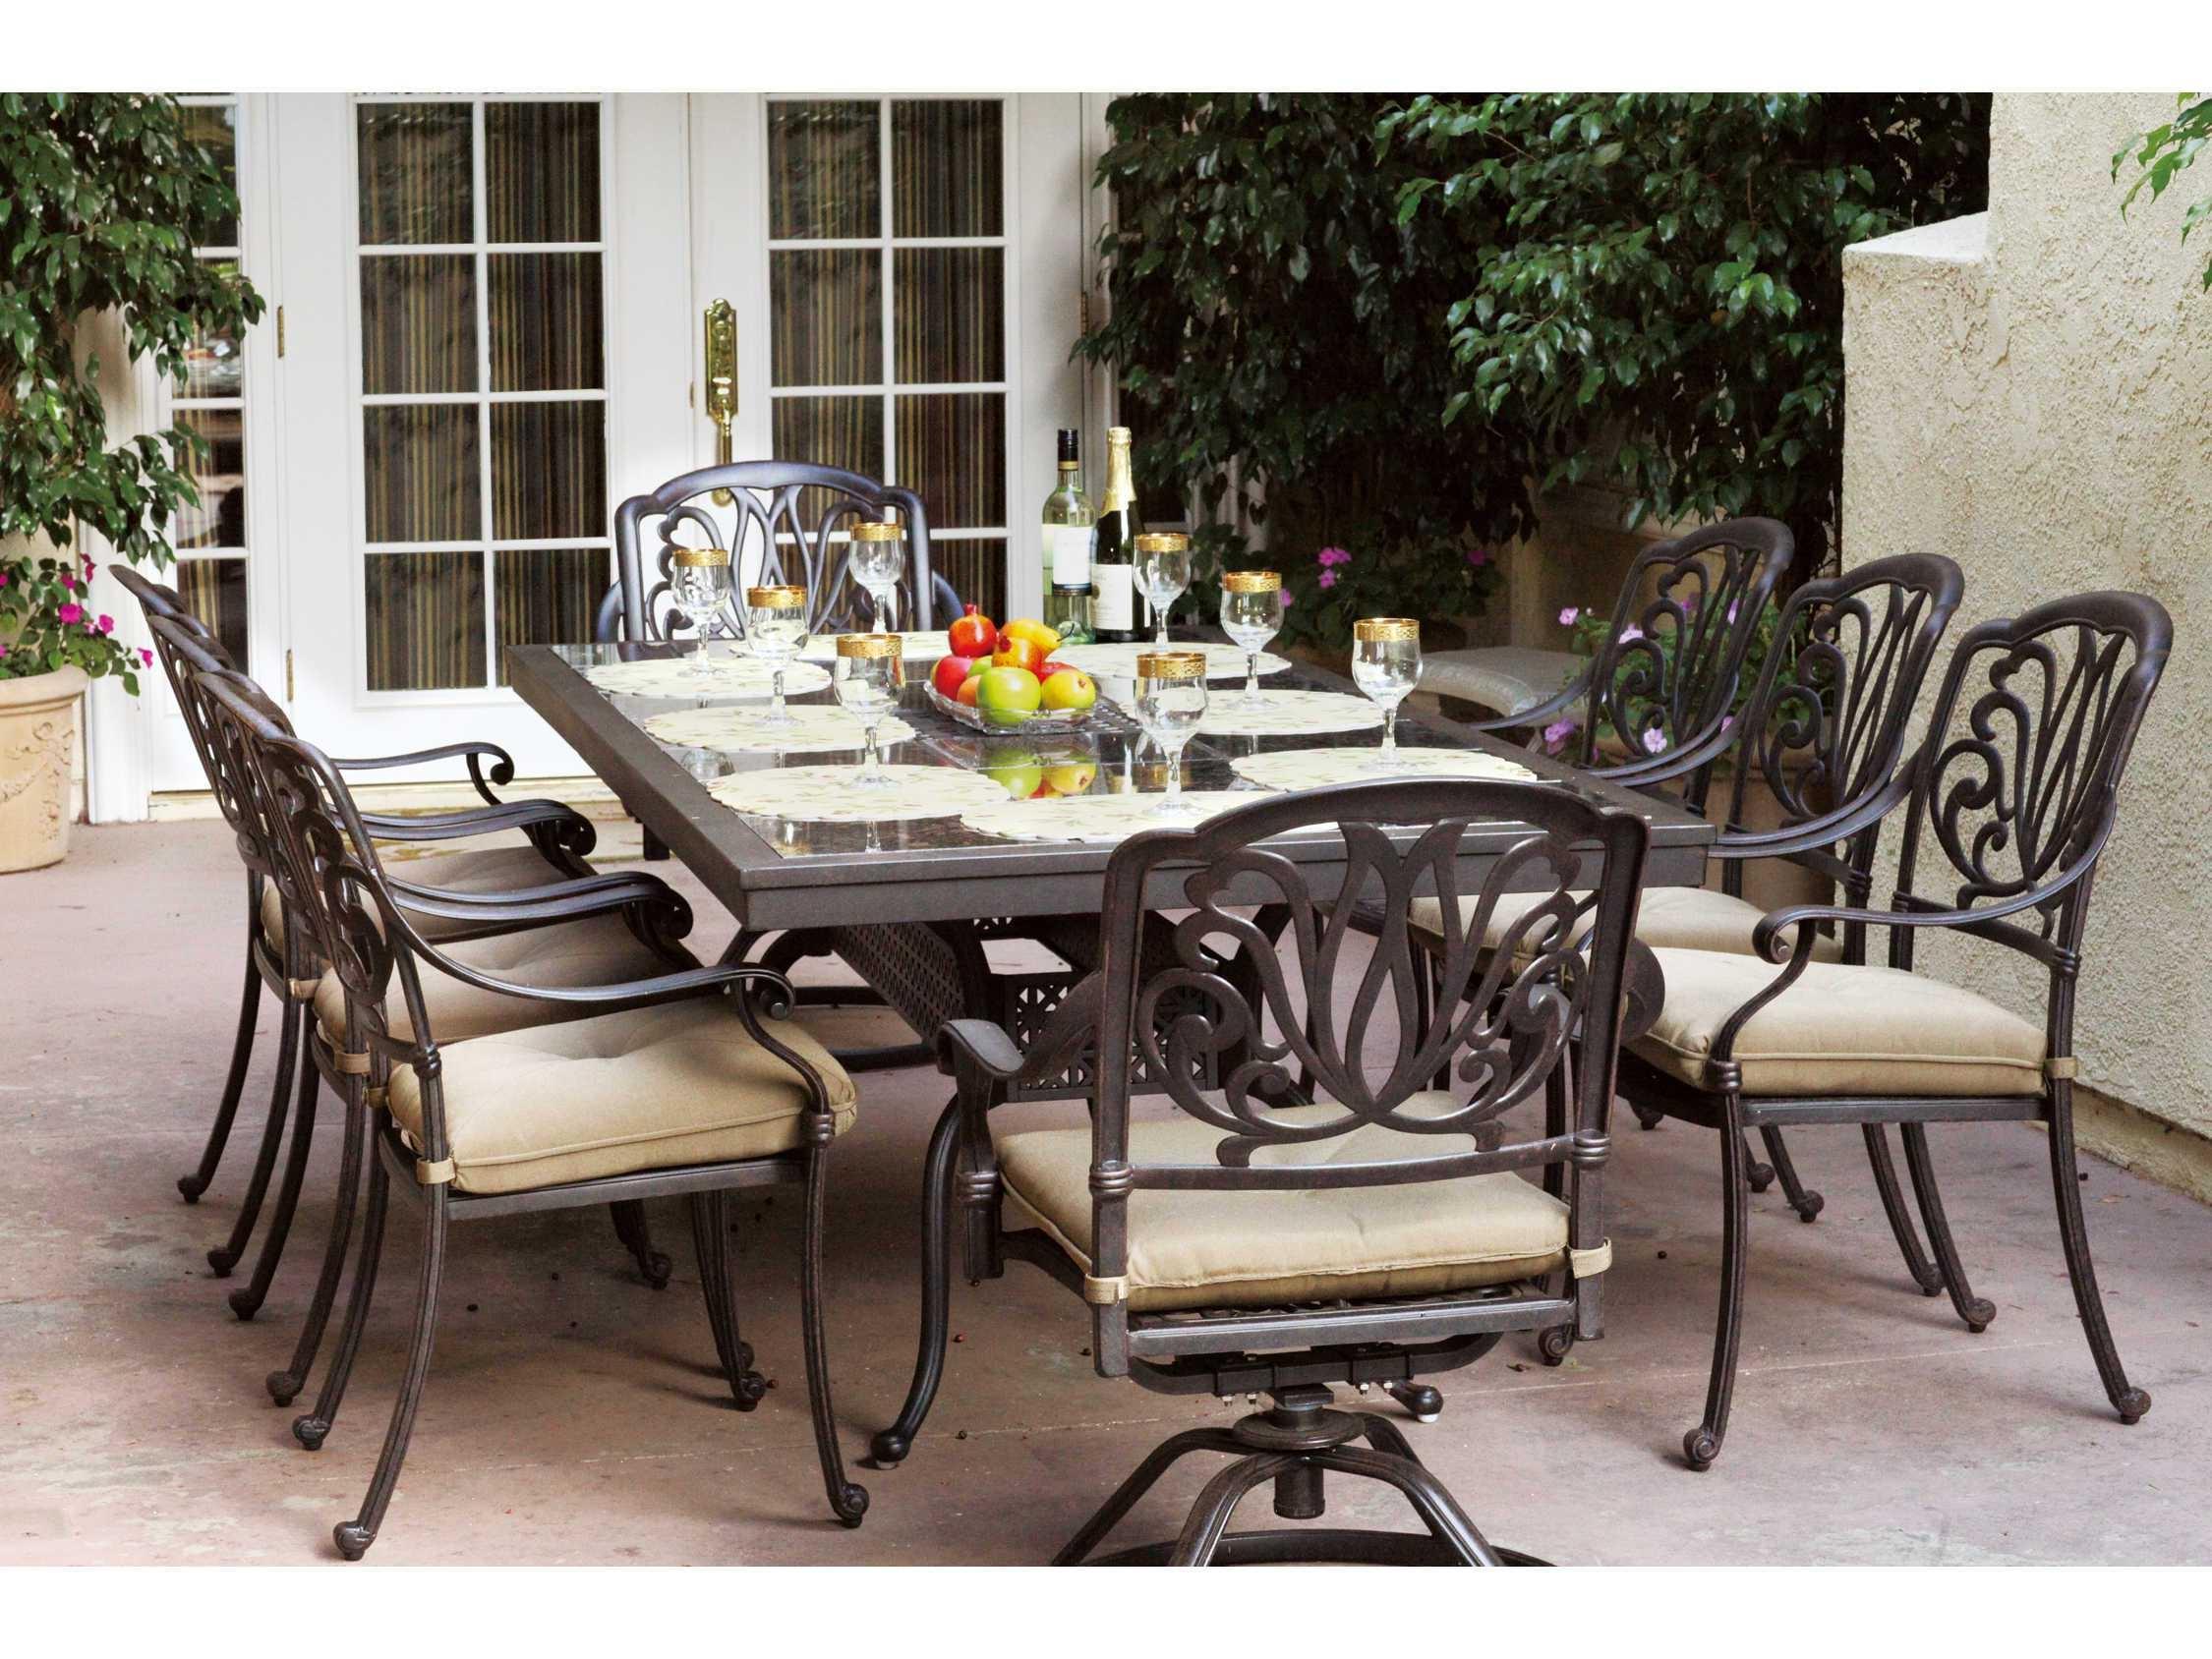 Darlee Elisabeth 8 Person Cast Aluminum Patio Dining Set With Granite Top  Table   Antique